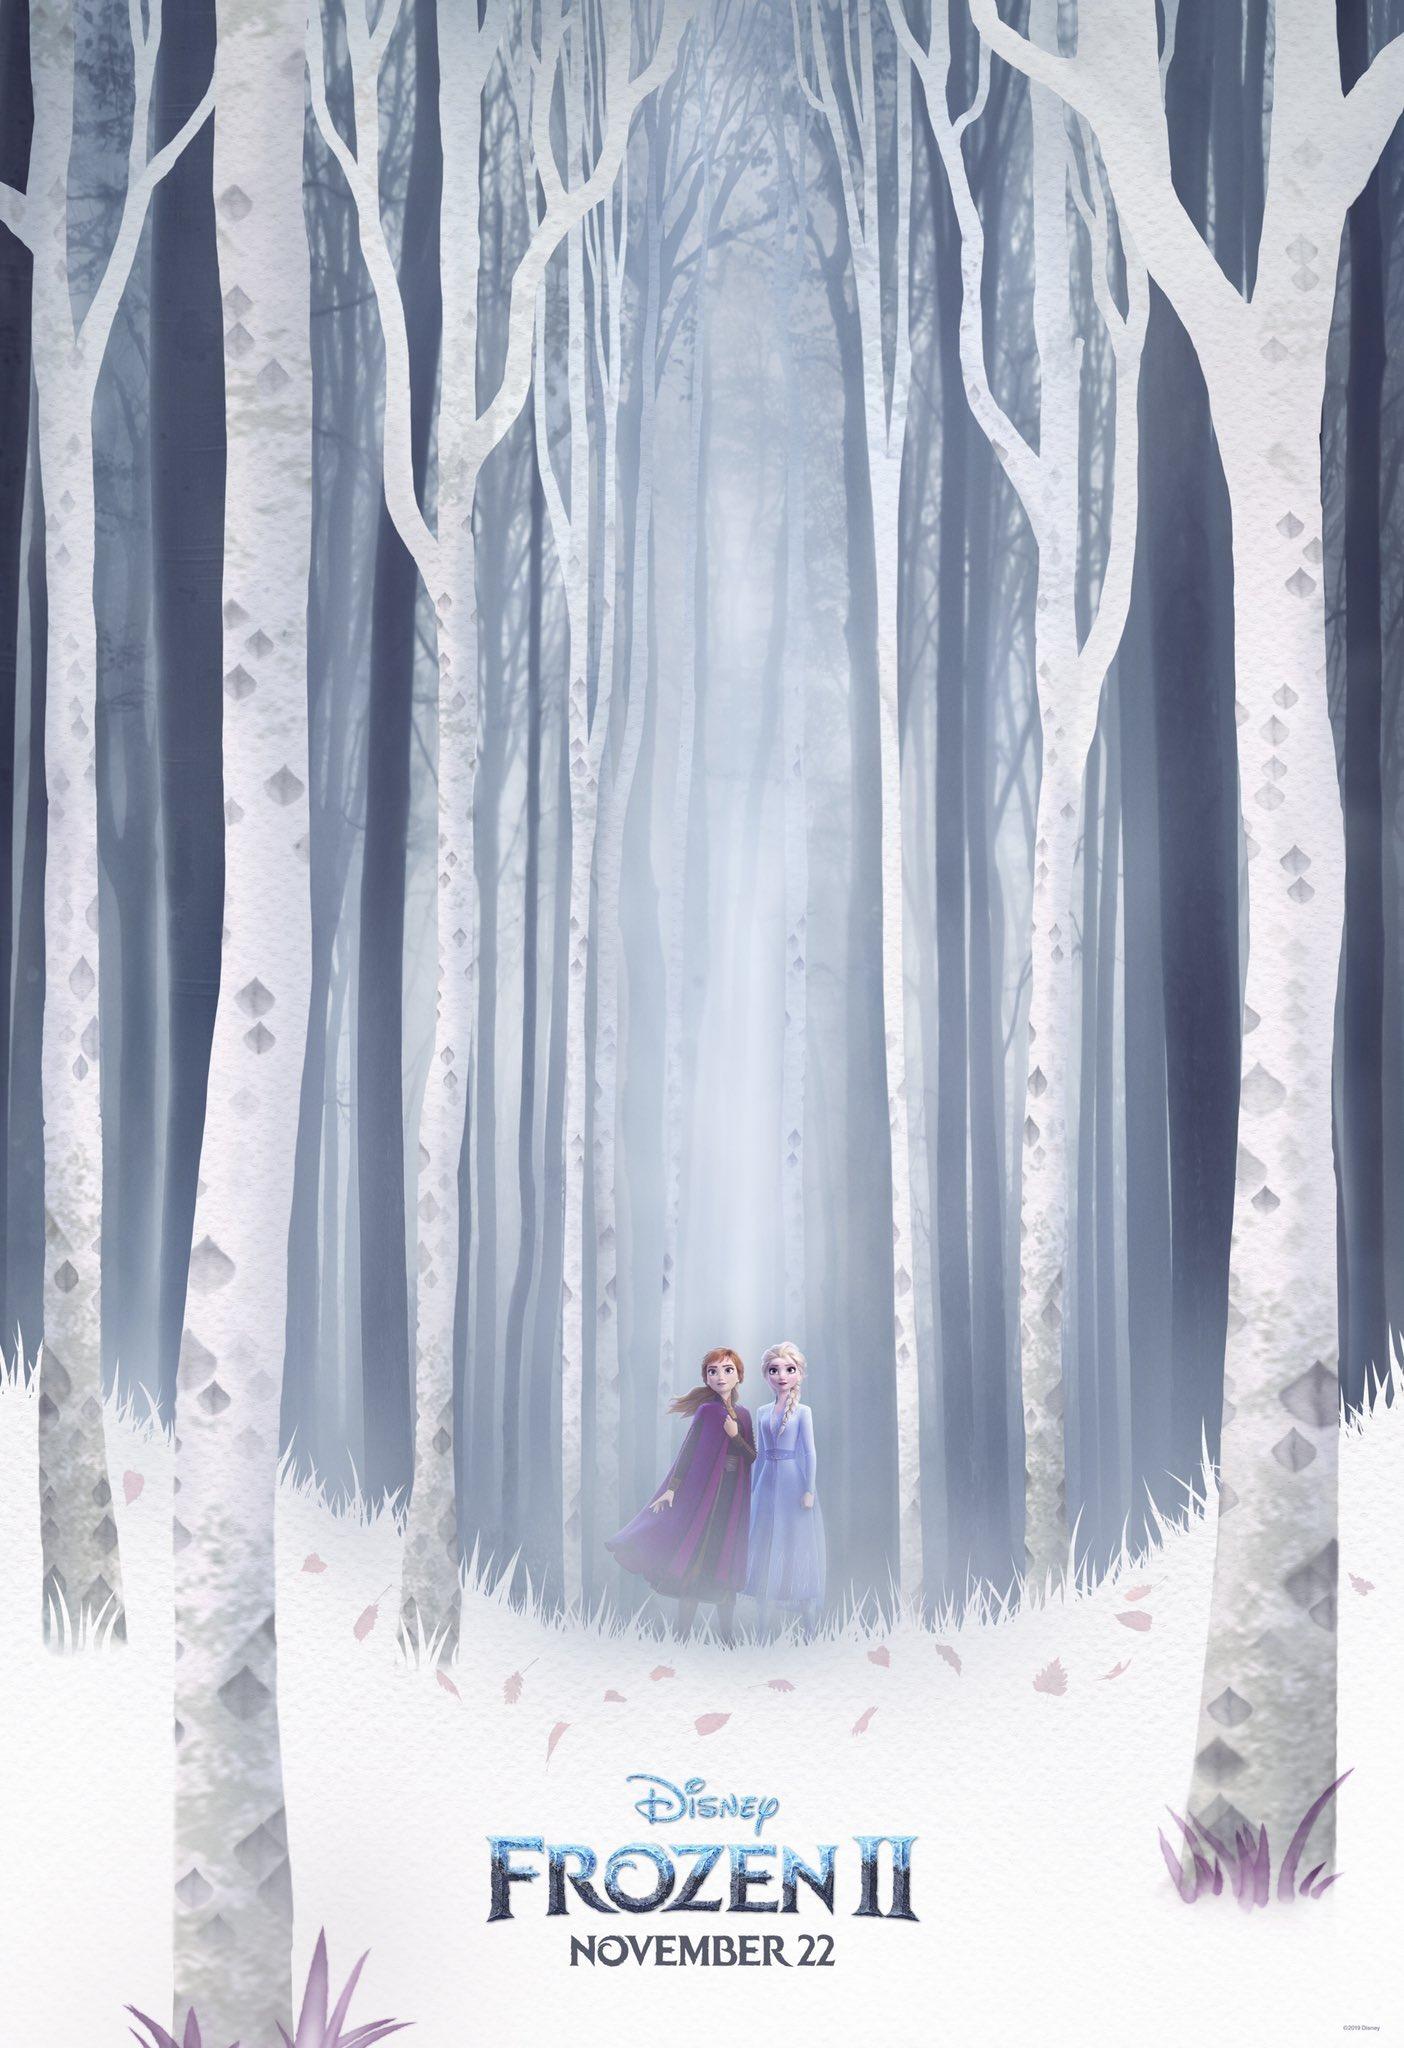 szmk_frozen_two_jegvarazs_2_anna_elza_elsa_olaf_swen_christoph_legyen_ho_arendelle_into_the_unknown_disney_4.jpg